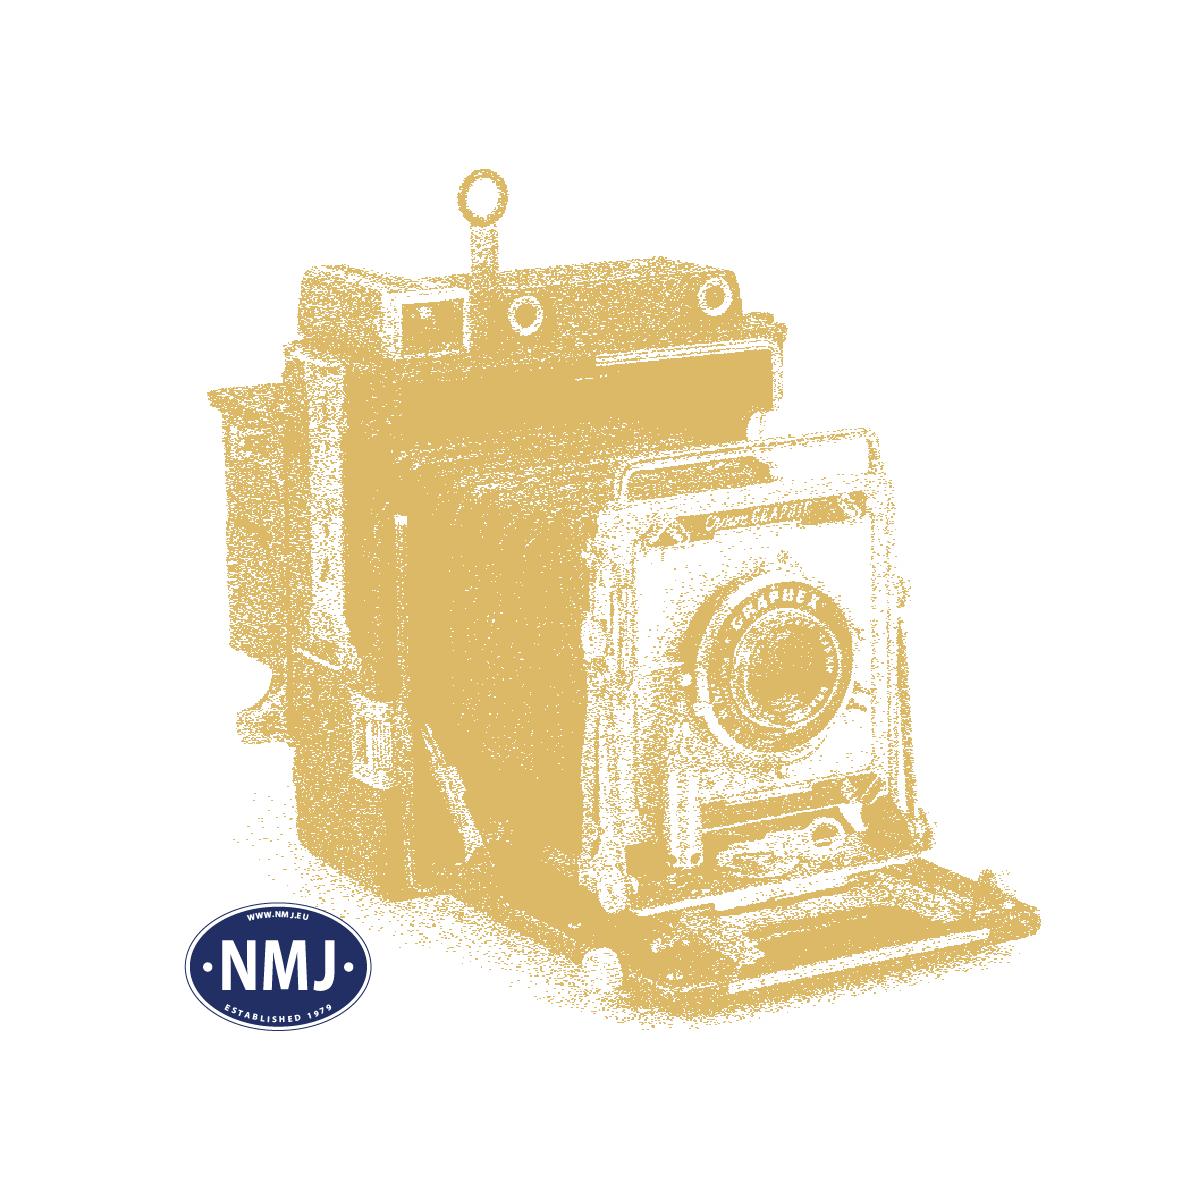 NMJT90011 - NMJ Topline Di3a.617, altes Design, DCC m/Sound